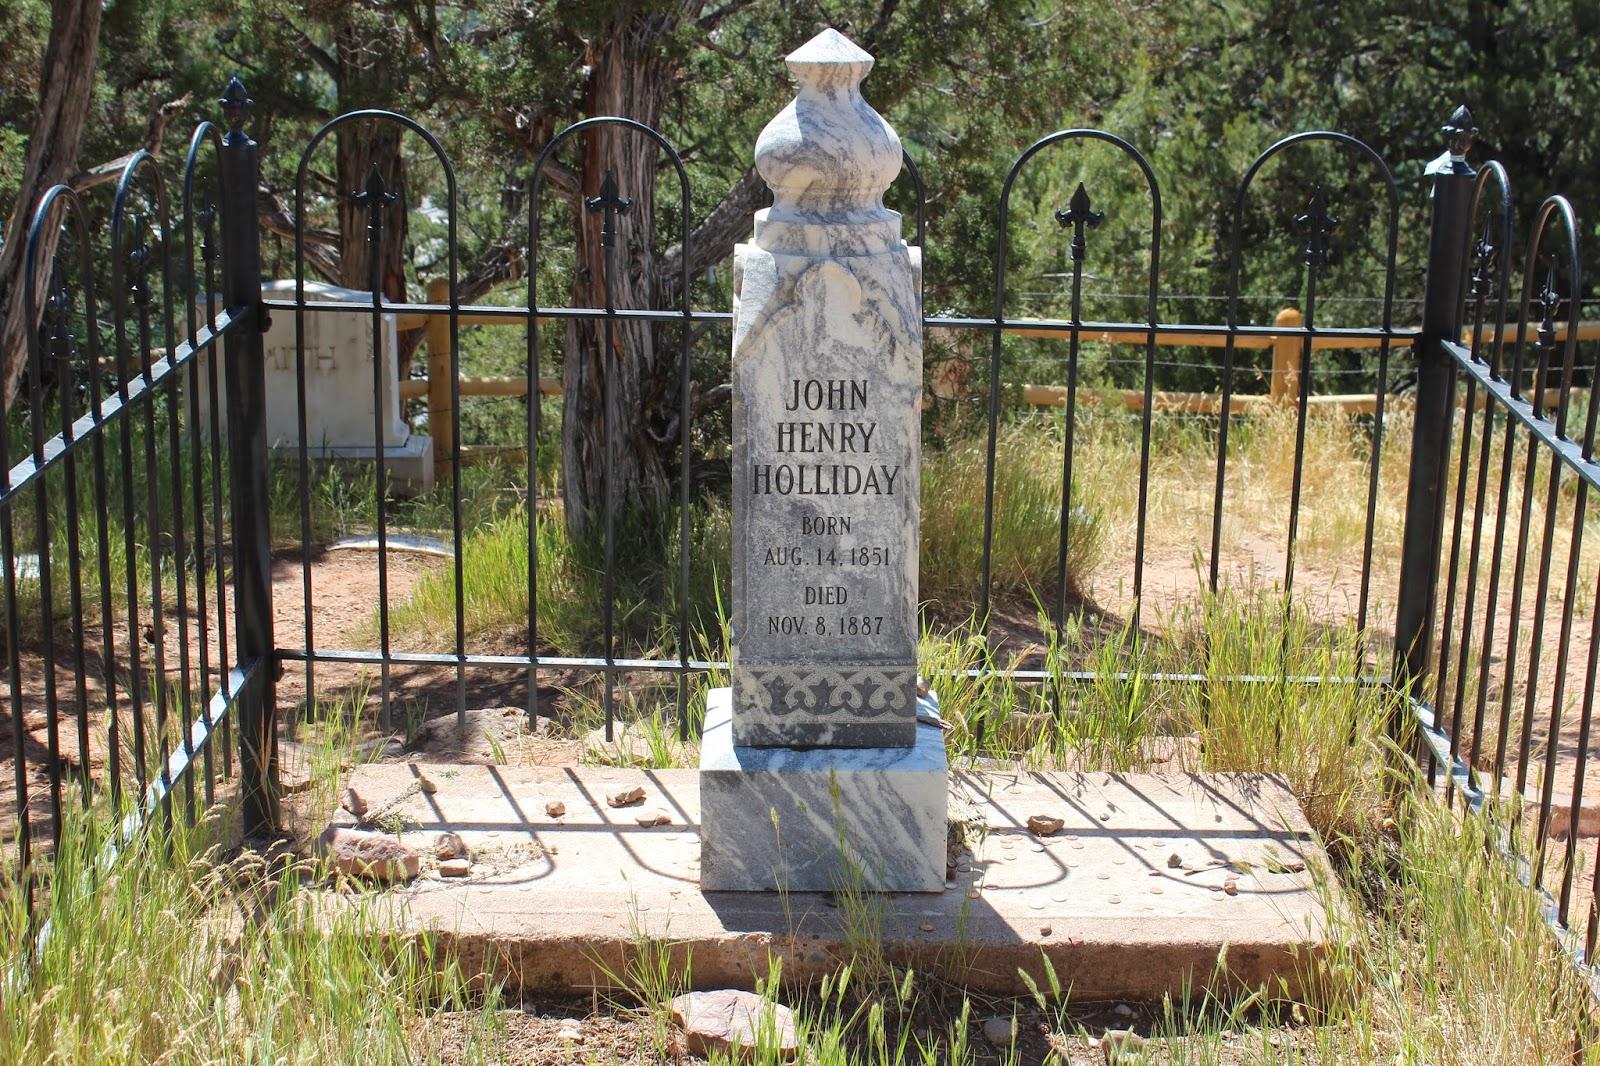 Wyatt Earp clipart burial Holliday's Johnny doc Gallery Of